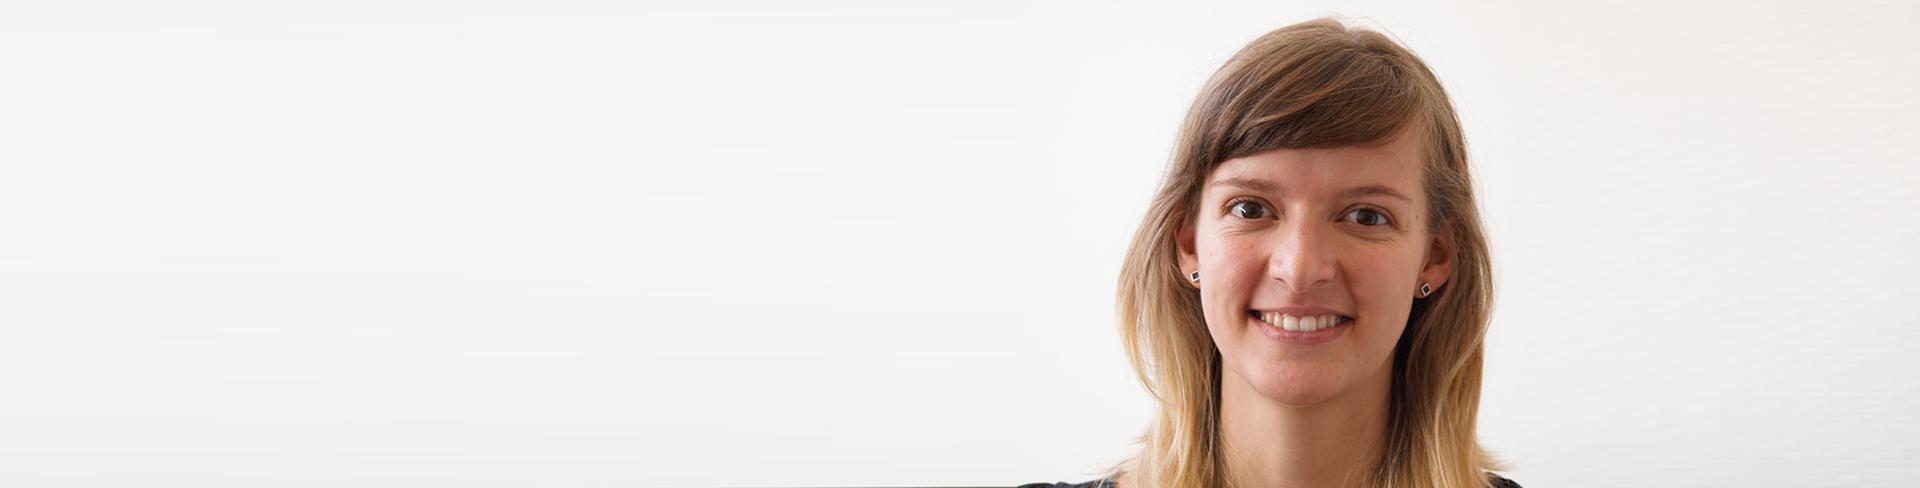 Dokter algemene geneeskunde Lieselotte De Bleeckere - Zwalm - Zottegem